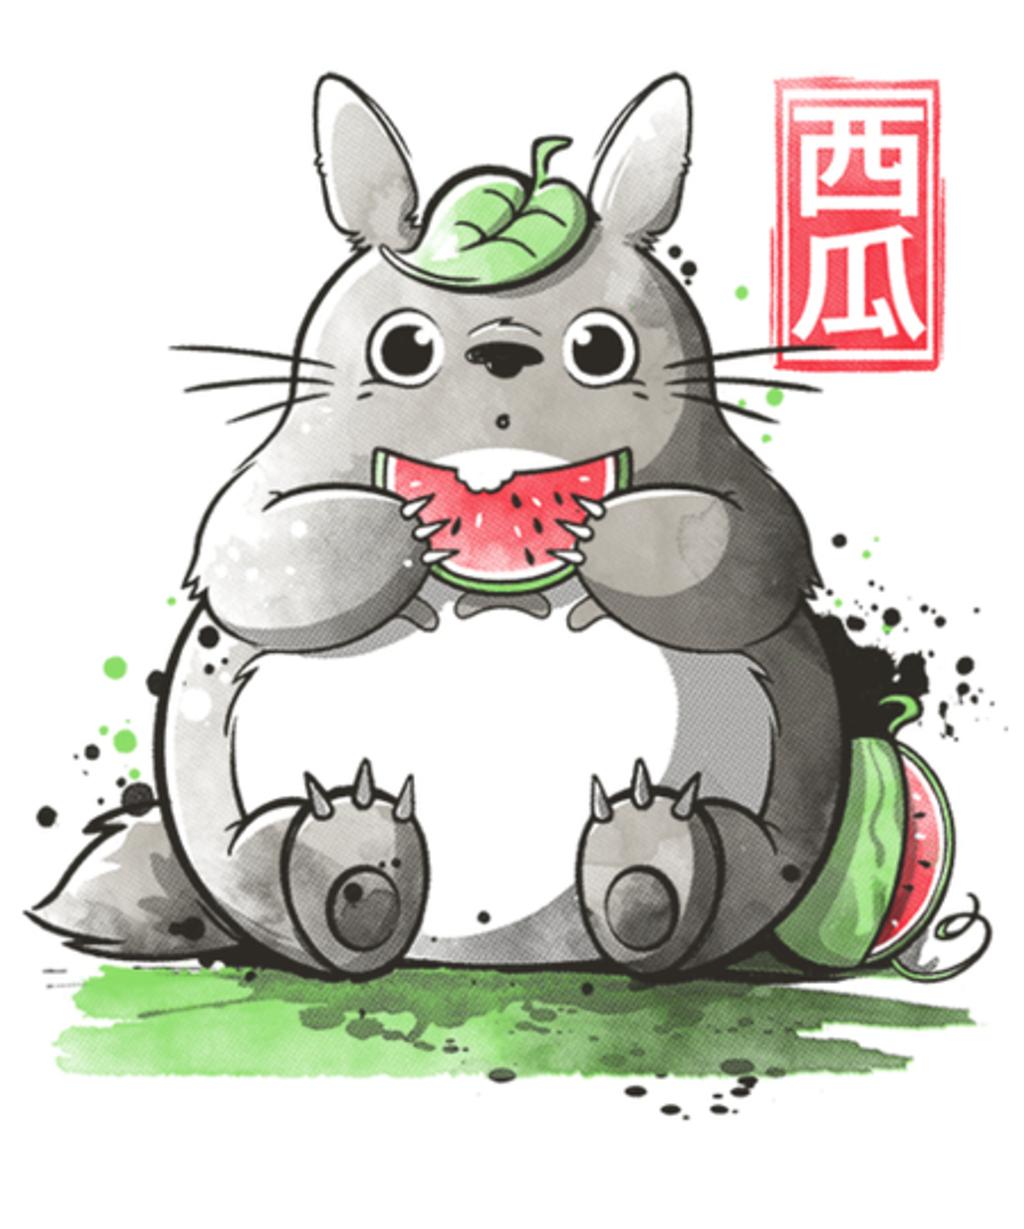 Qwertee: My neighbor watermelon